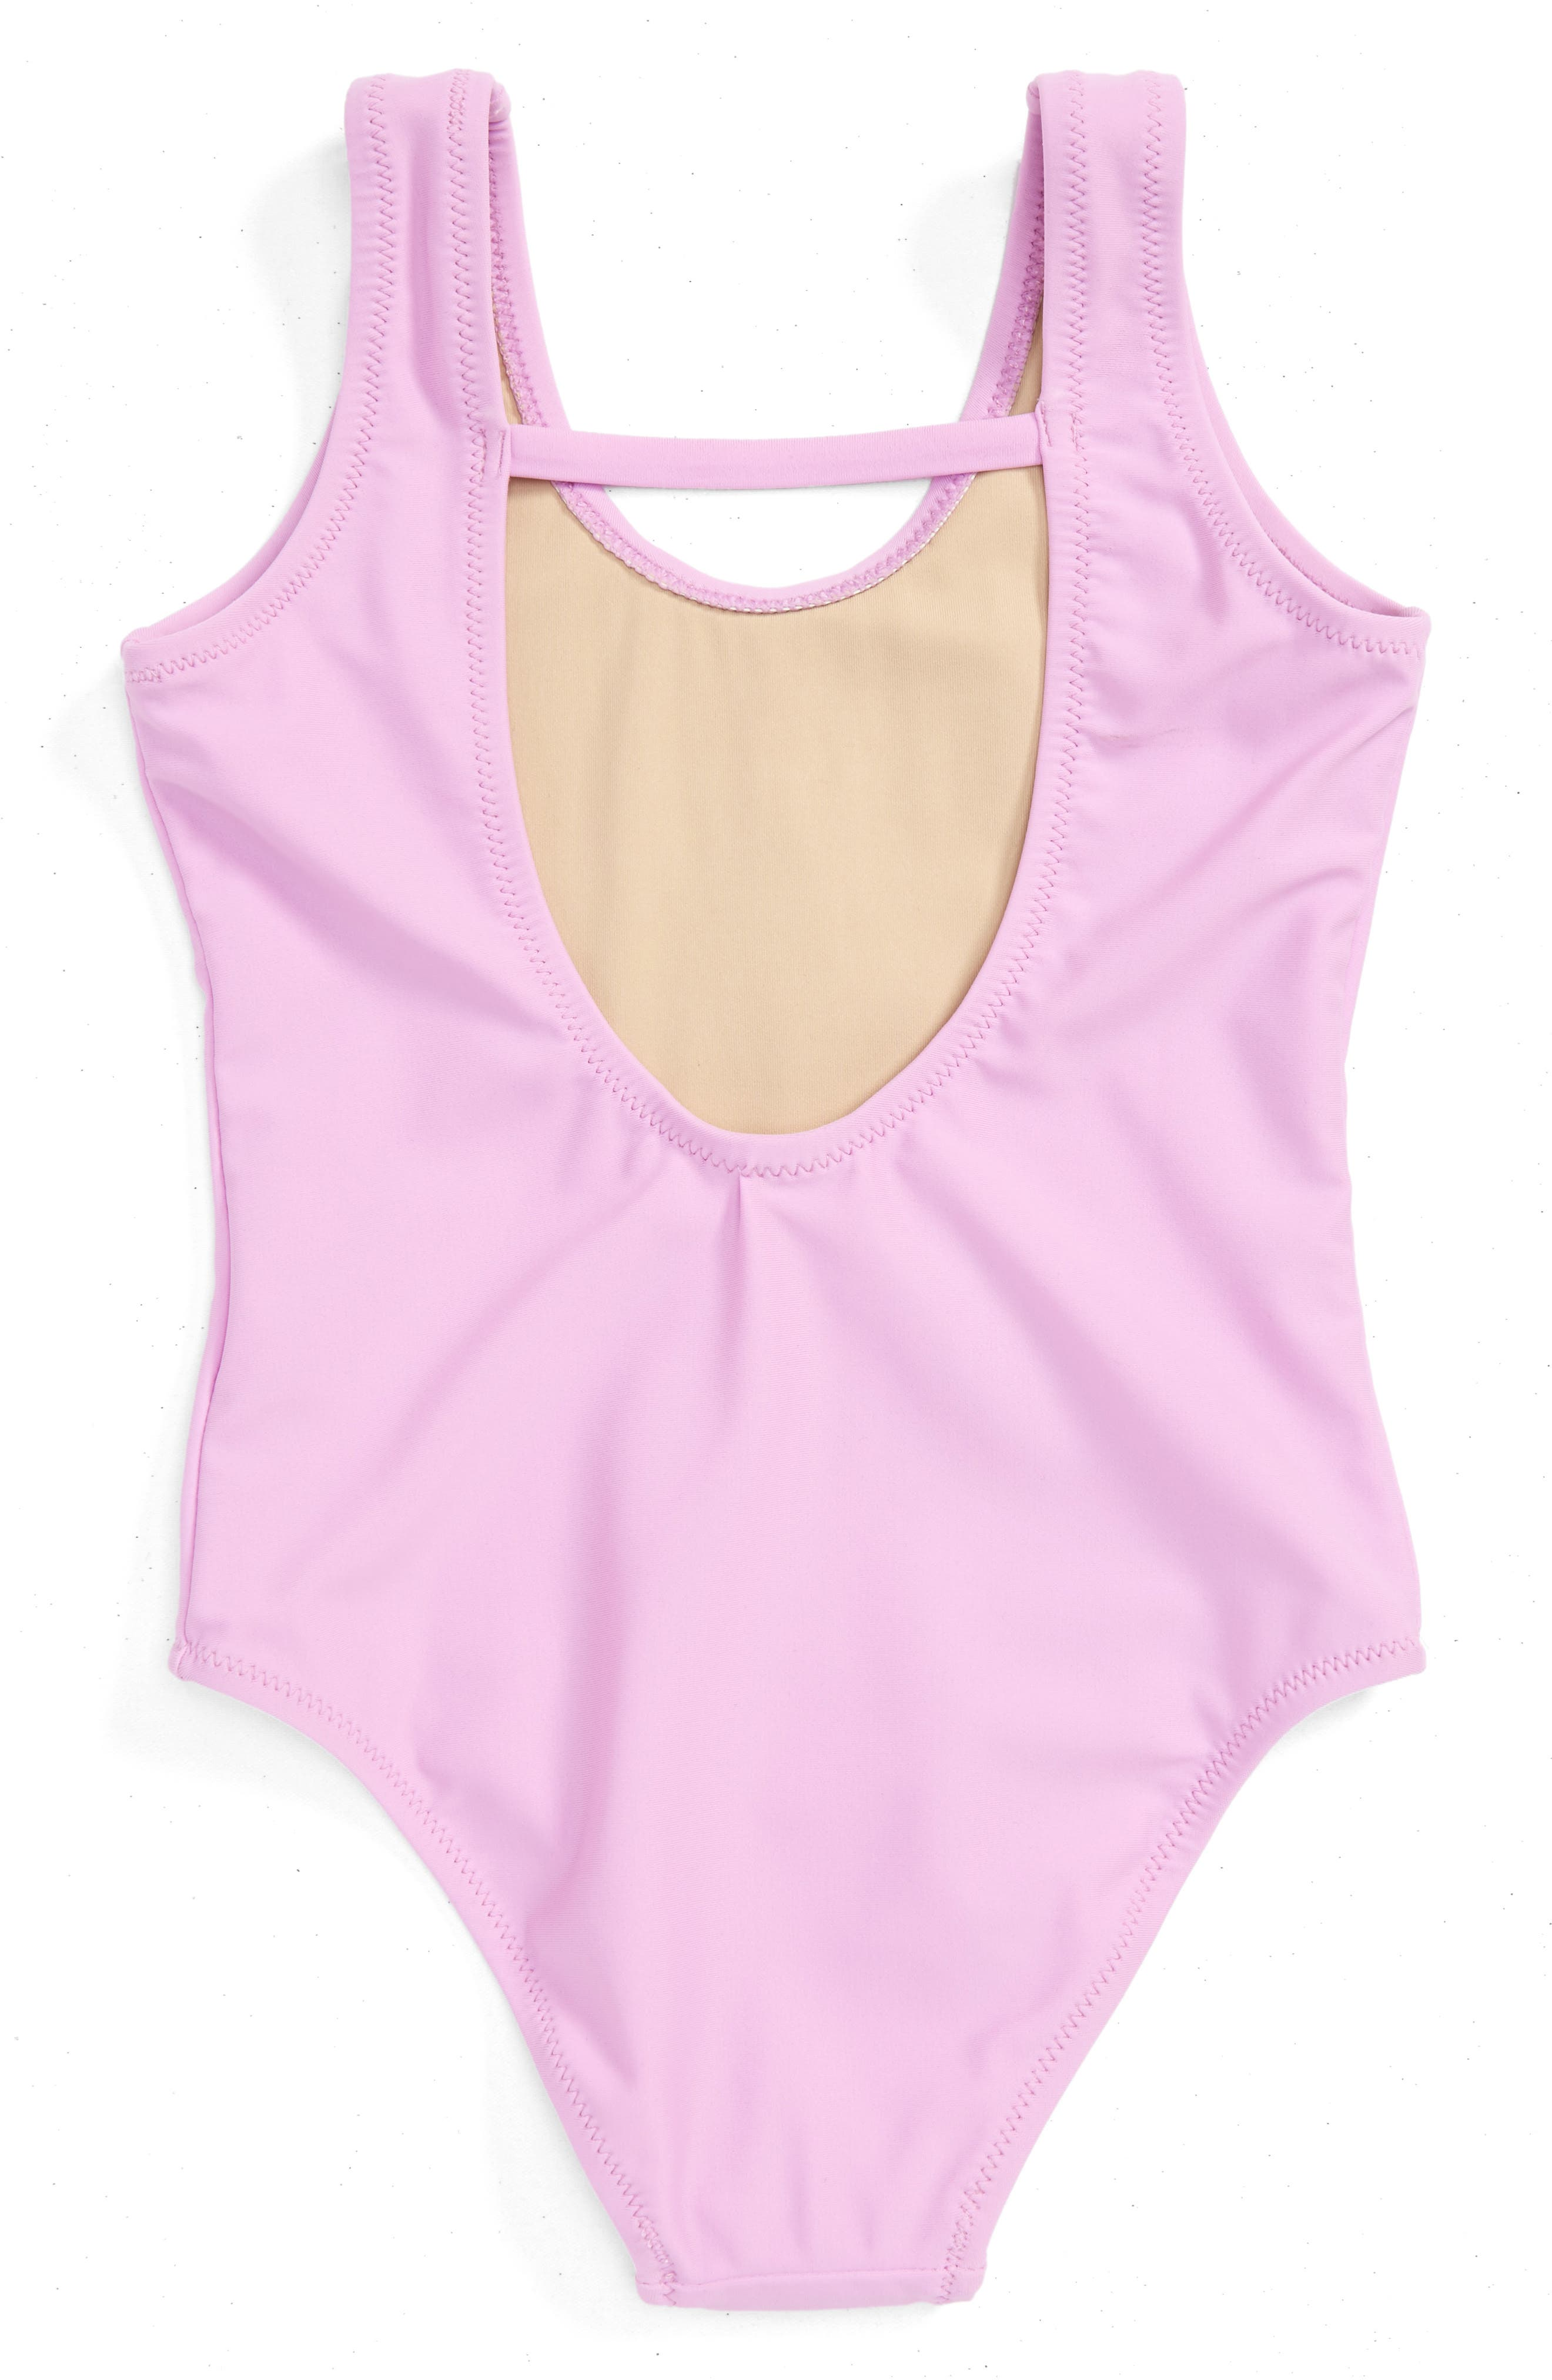 Alternate Image 2  - Shade Critters Lifeguard One-Piece Swimsuit (Toddler Girls & Little Girls)